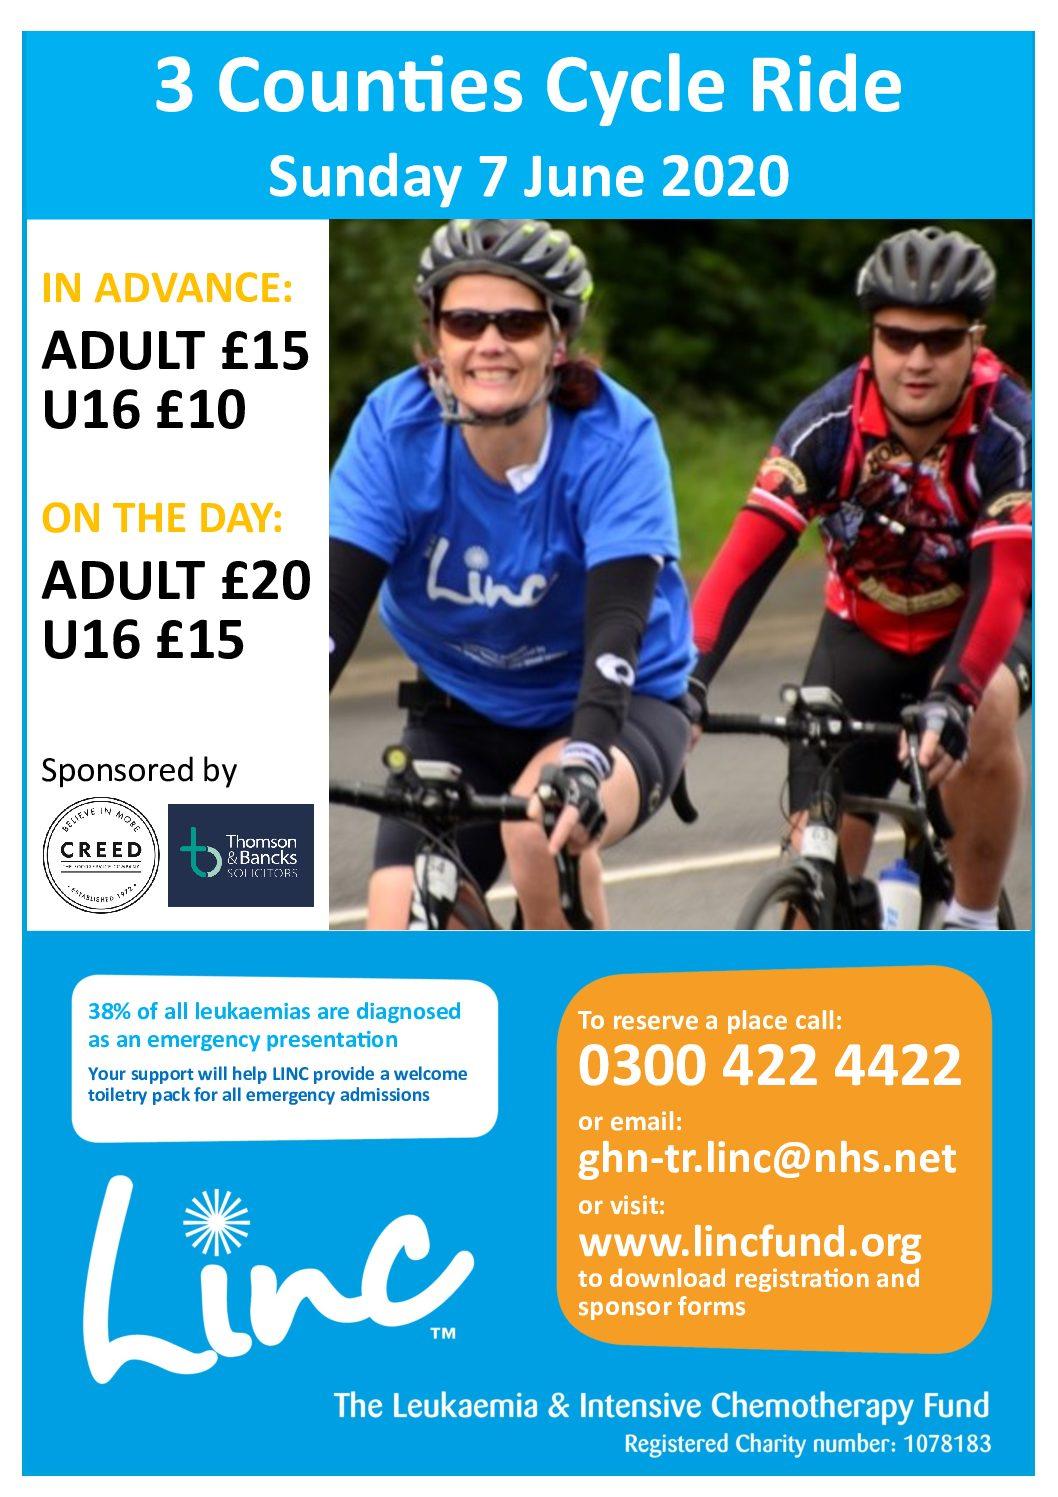 Leukaemia and Intensive Chemotherapy (LINC) charity ride